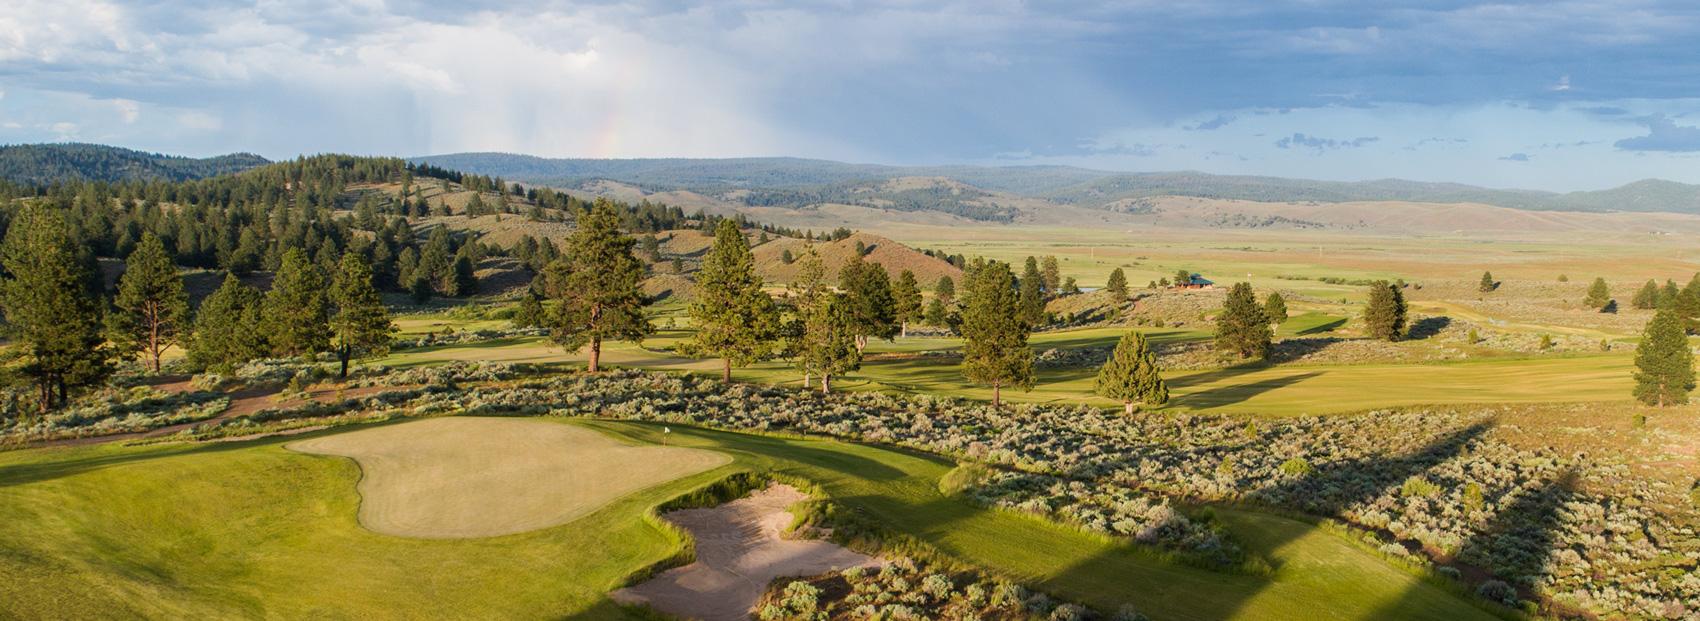 Enjoy golf with sweeping views at Silvies Valley Ranch